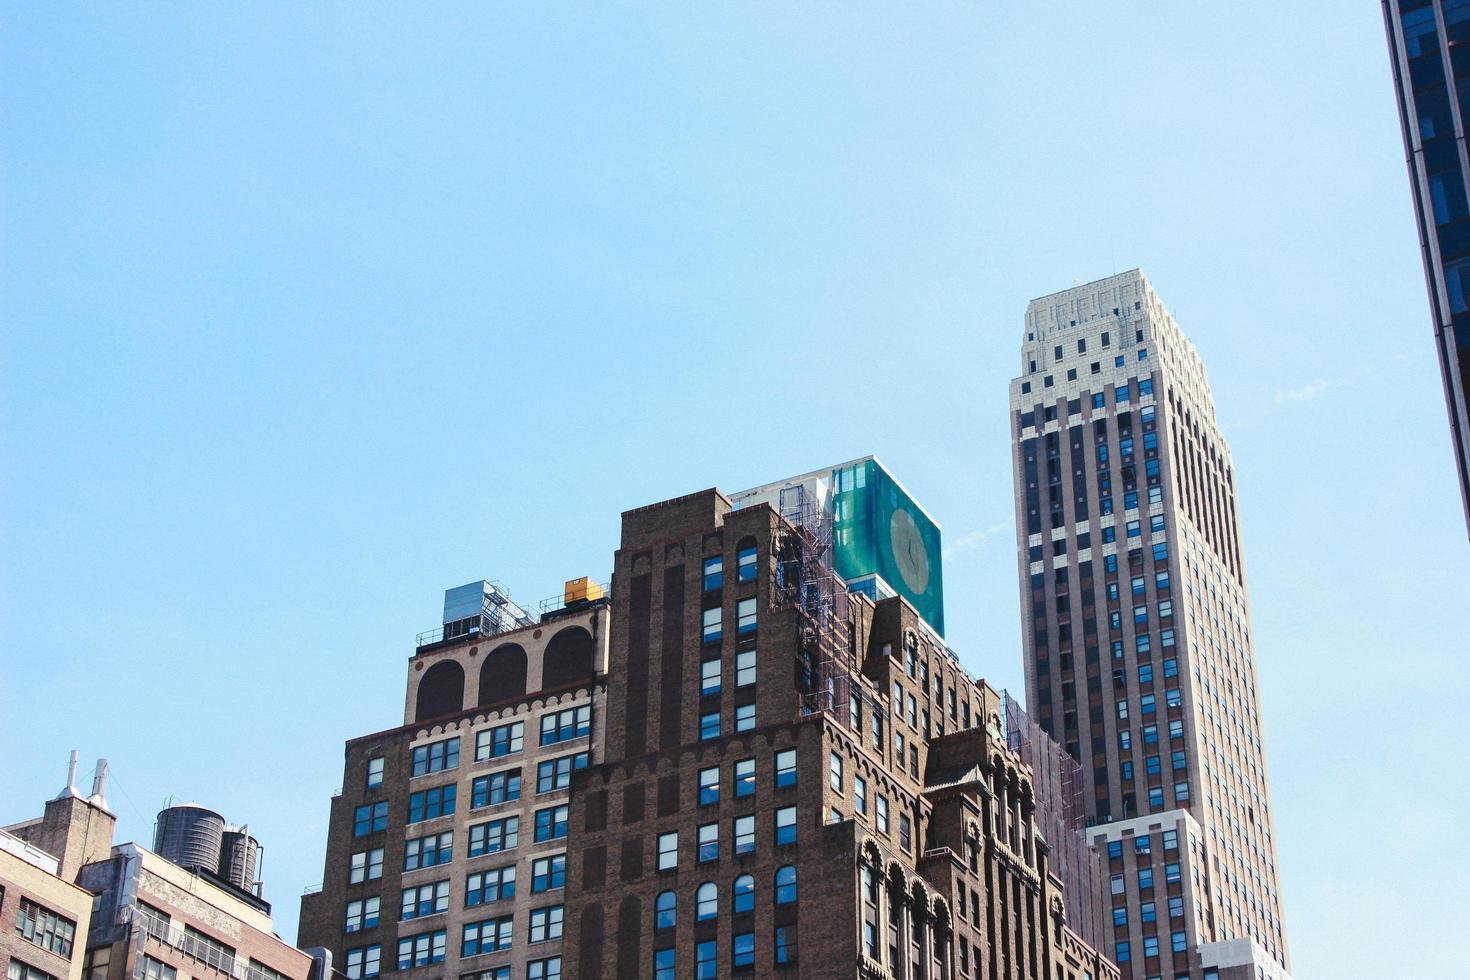 New York City, 2020 - Hochhäuser in New York foto